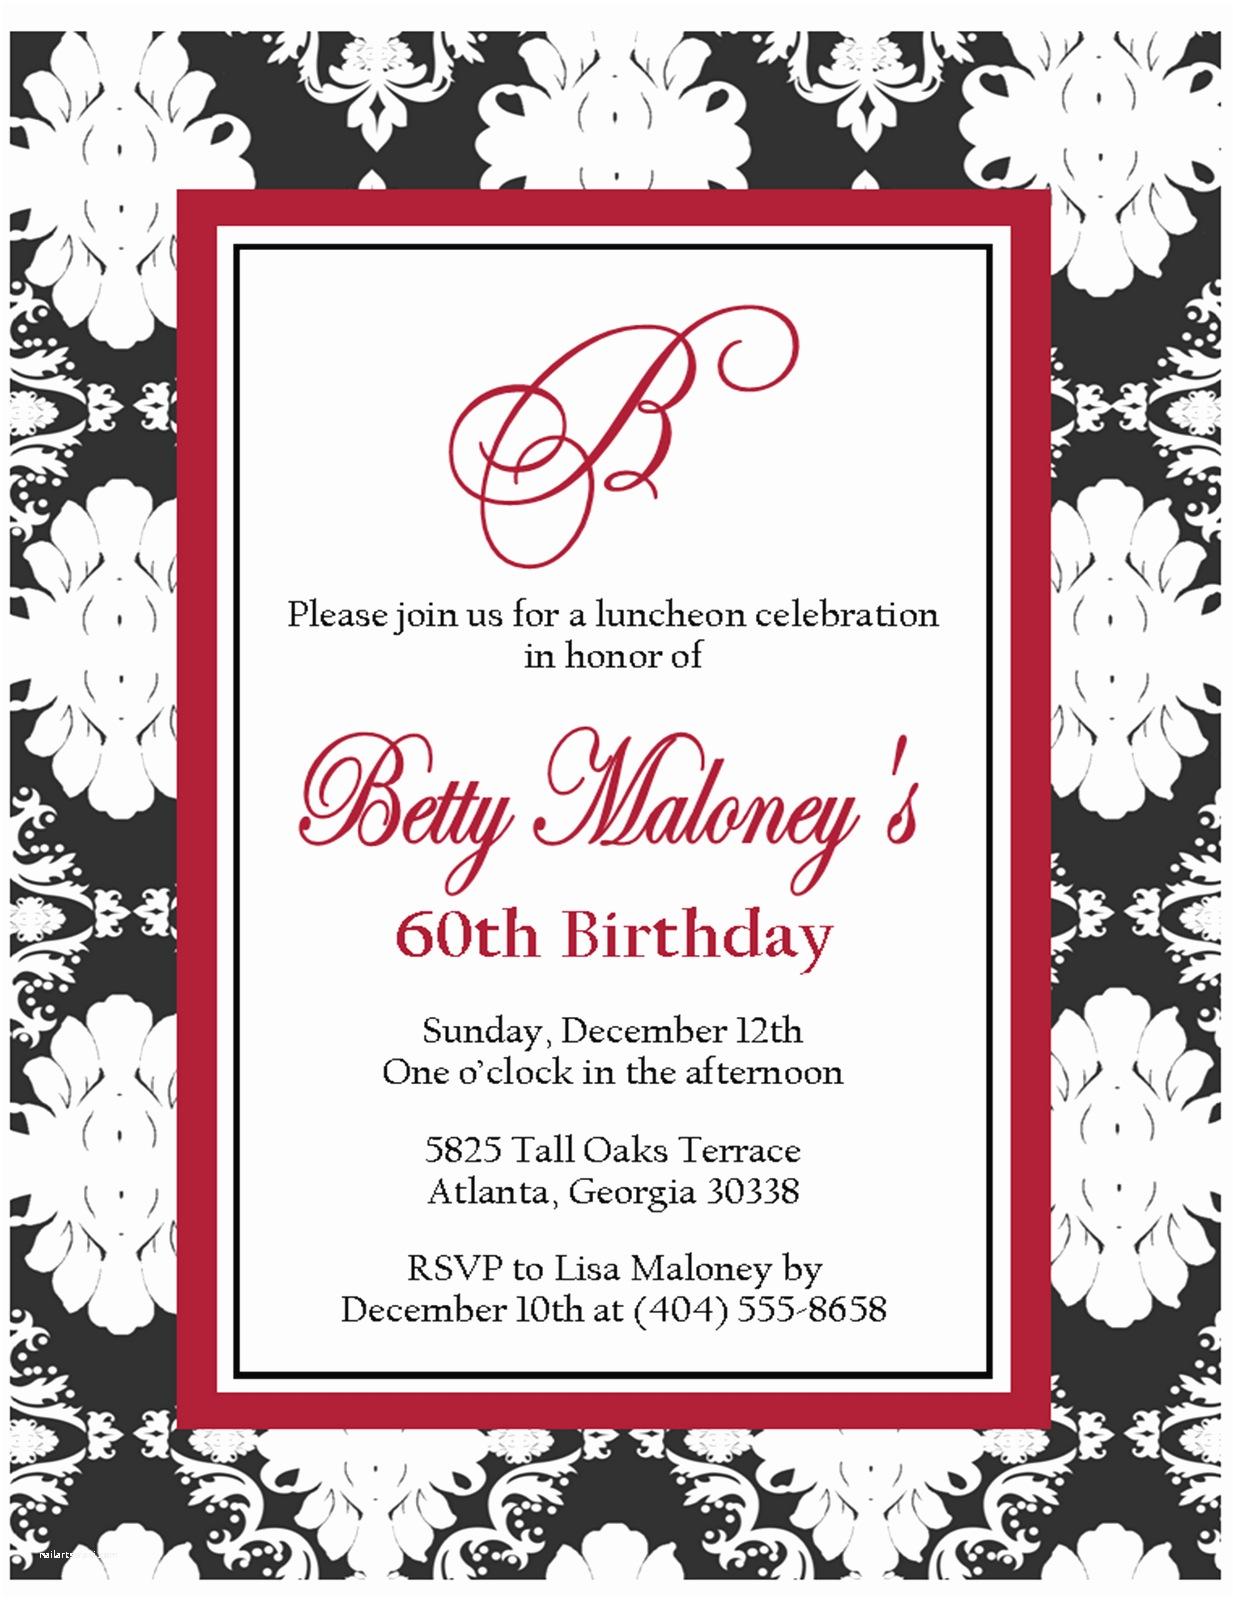 Black and White Birthday Invitations Free Printable Black and White Birthday Invitation